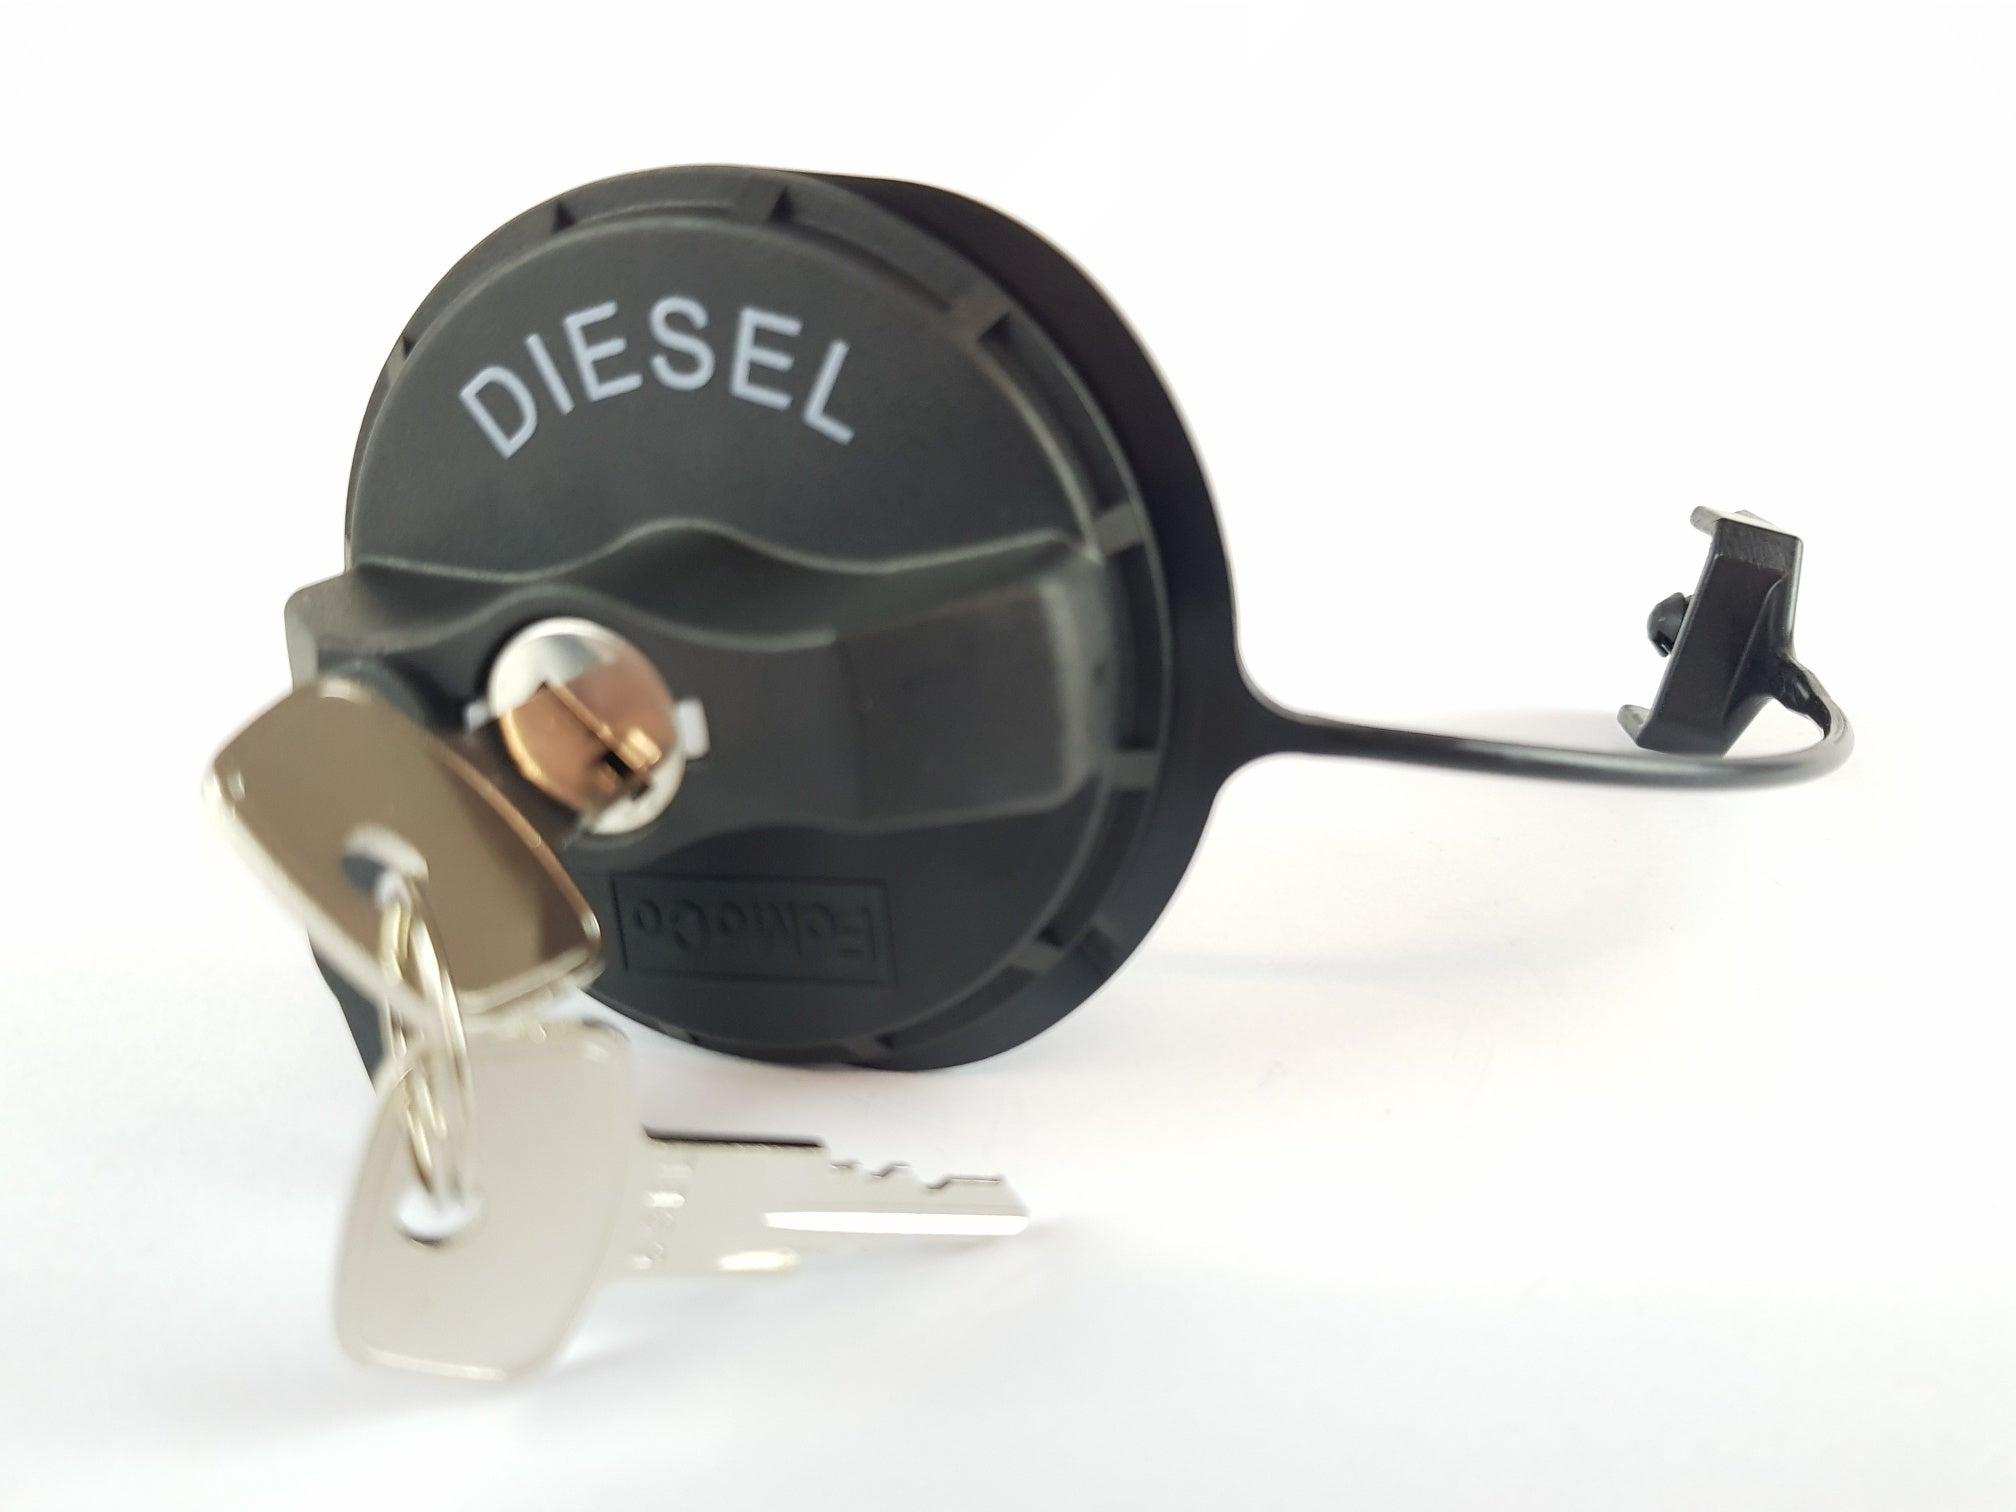 Genuine Mazda BT-50 UP UR Diesel Fuel Tank Filler Cap Lockable UC9H42250B